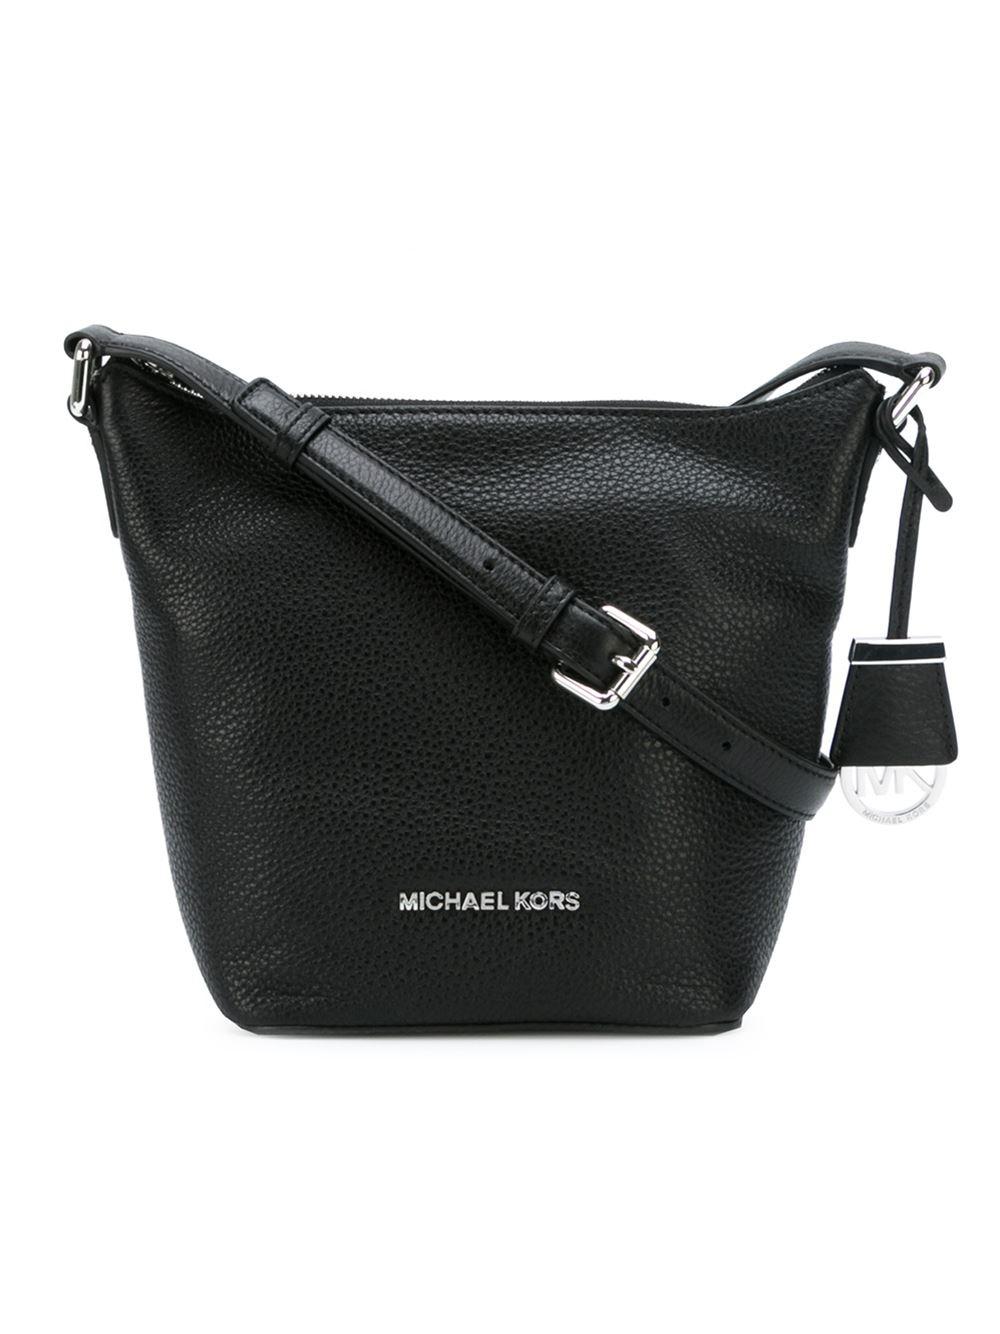 02fa739eac4a MICHAEL Michael Kors Small 'bedford' Messenger Bag in Black - Lyst